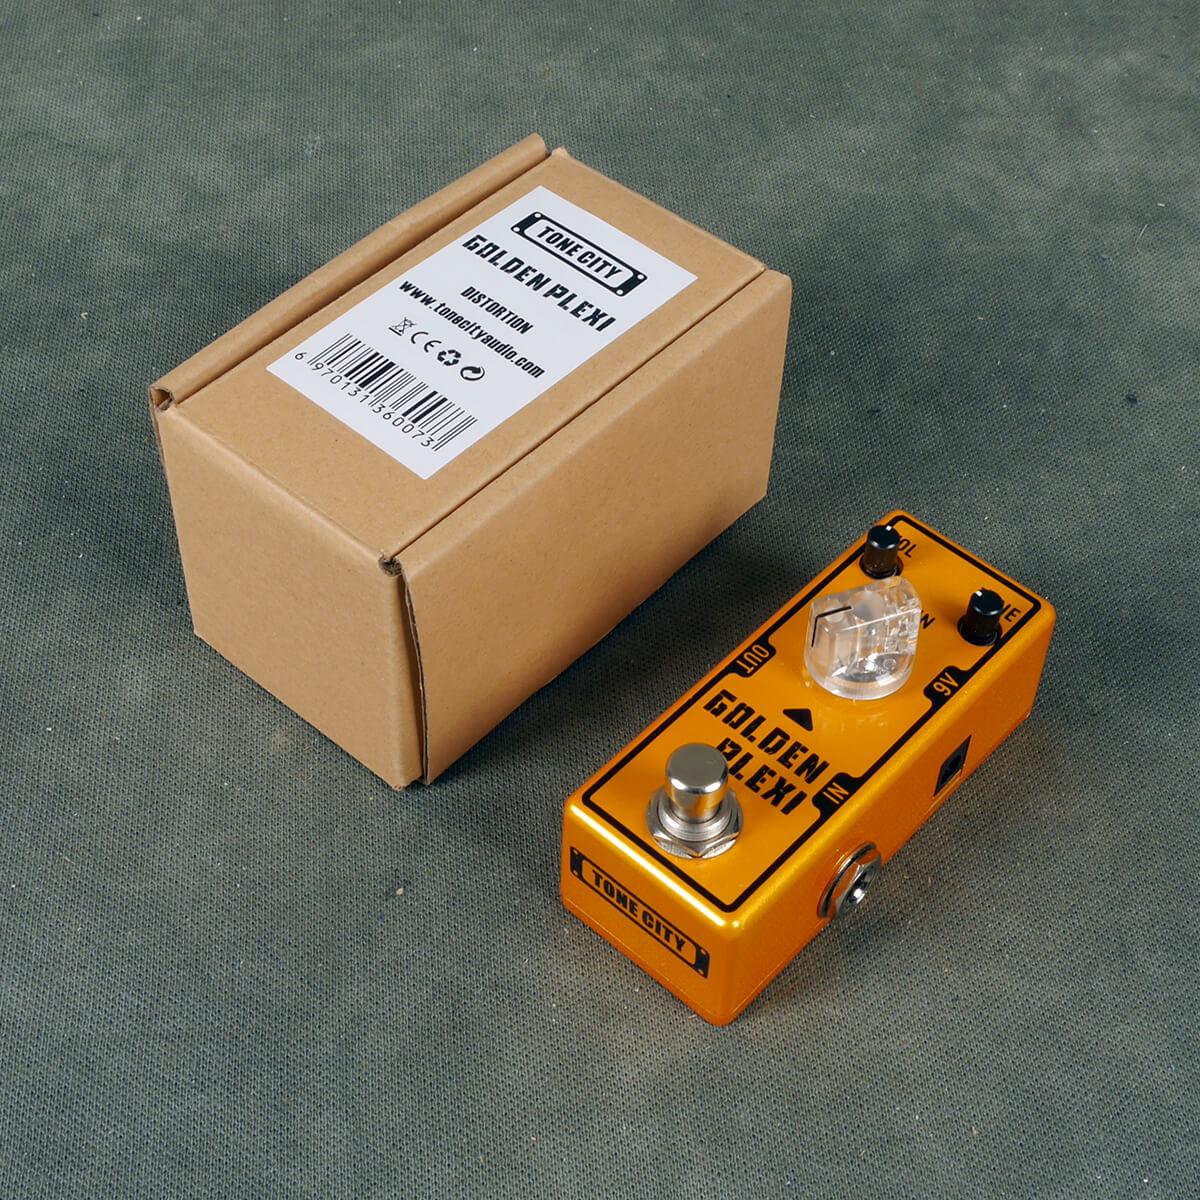 Tone City Plexi Overdrive FX Pedal w/Box - 2nd Hand